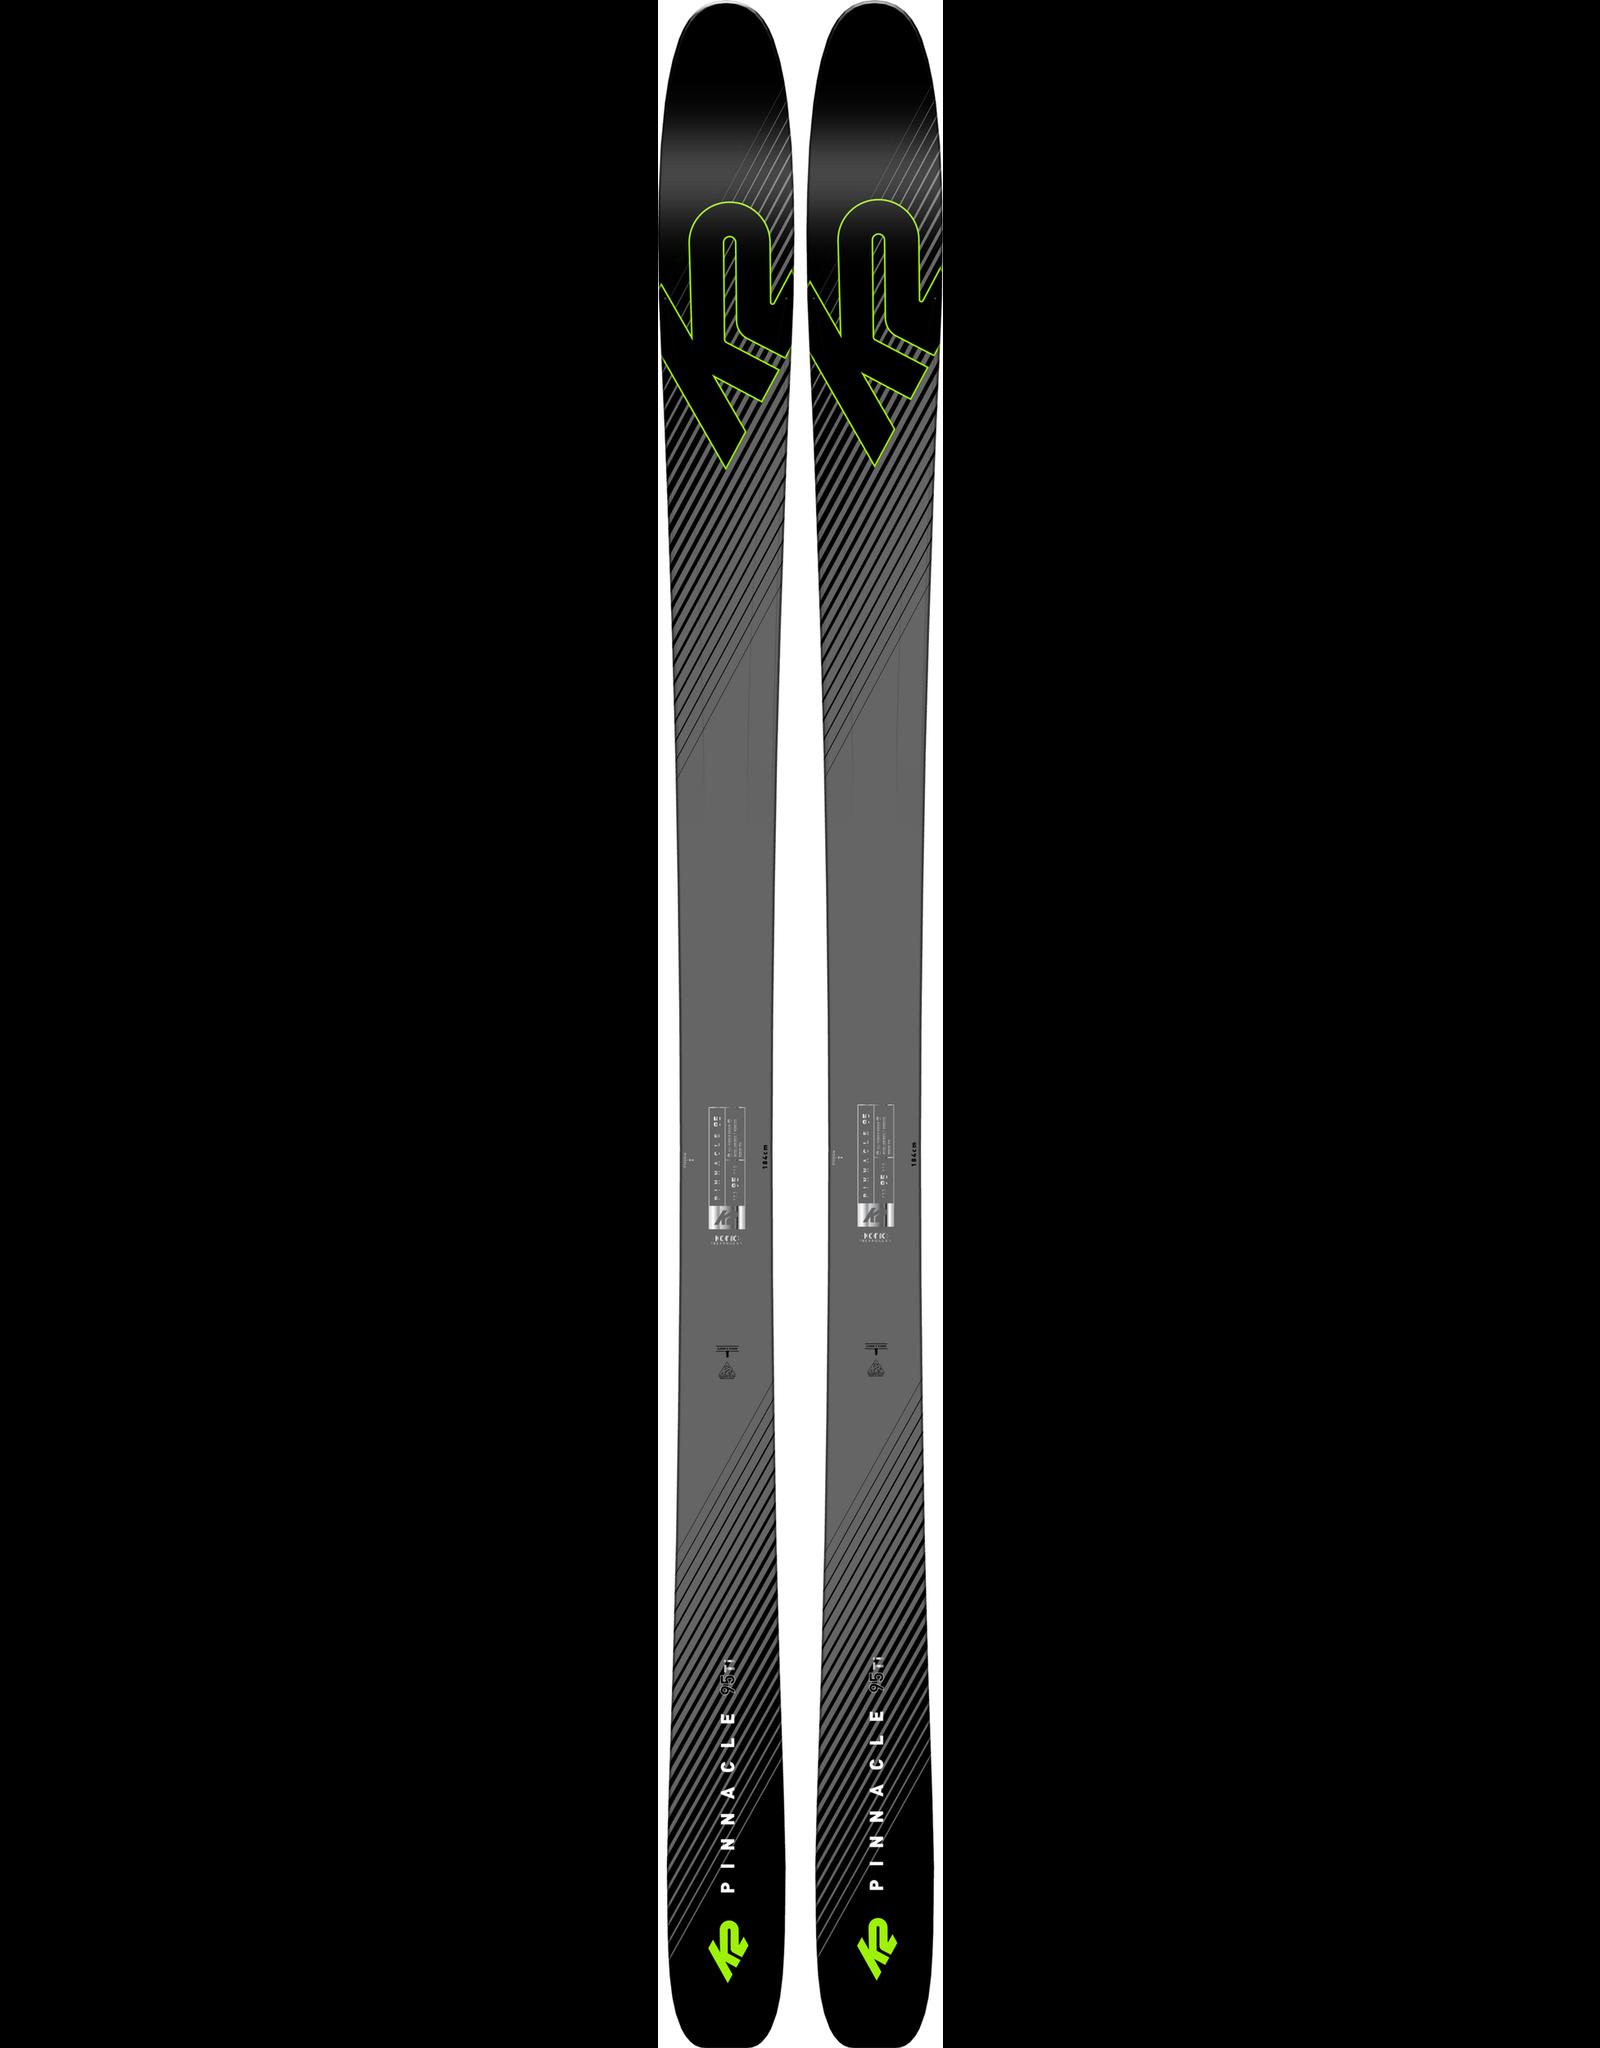 K2 SKI K2 F18 PINNACLE 95 TI 19